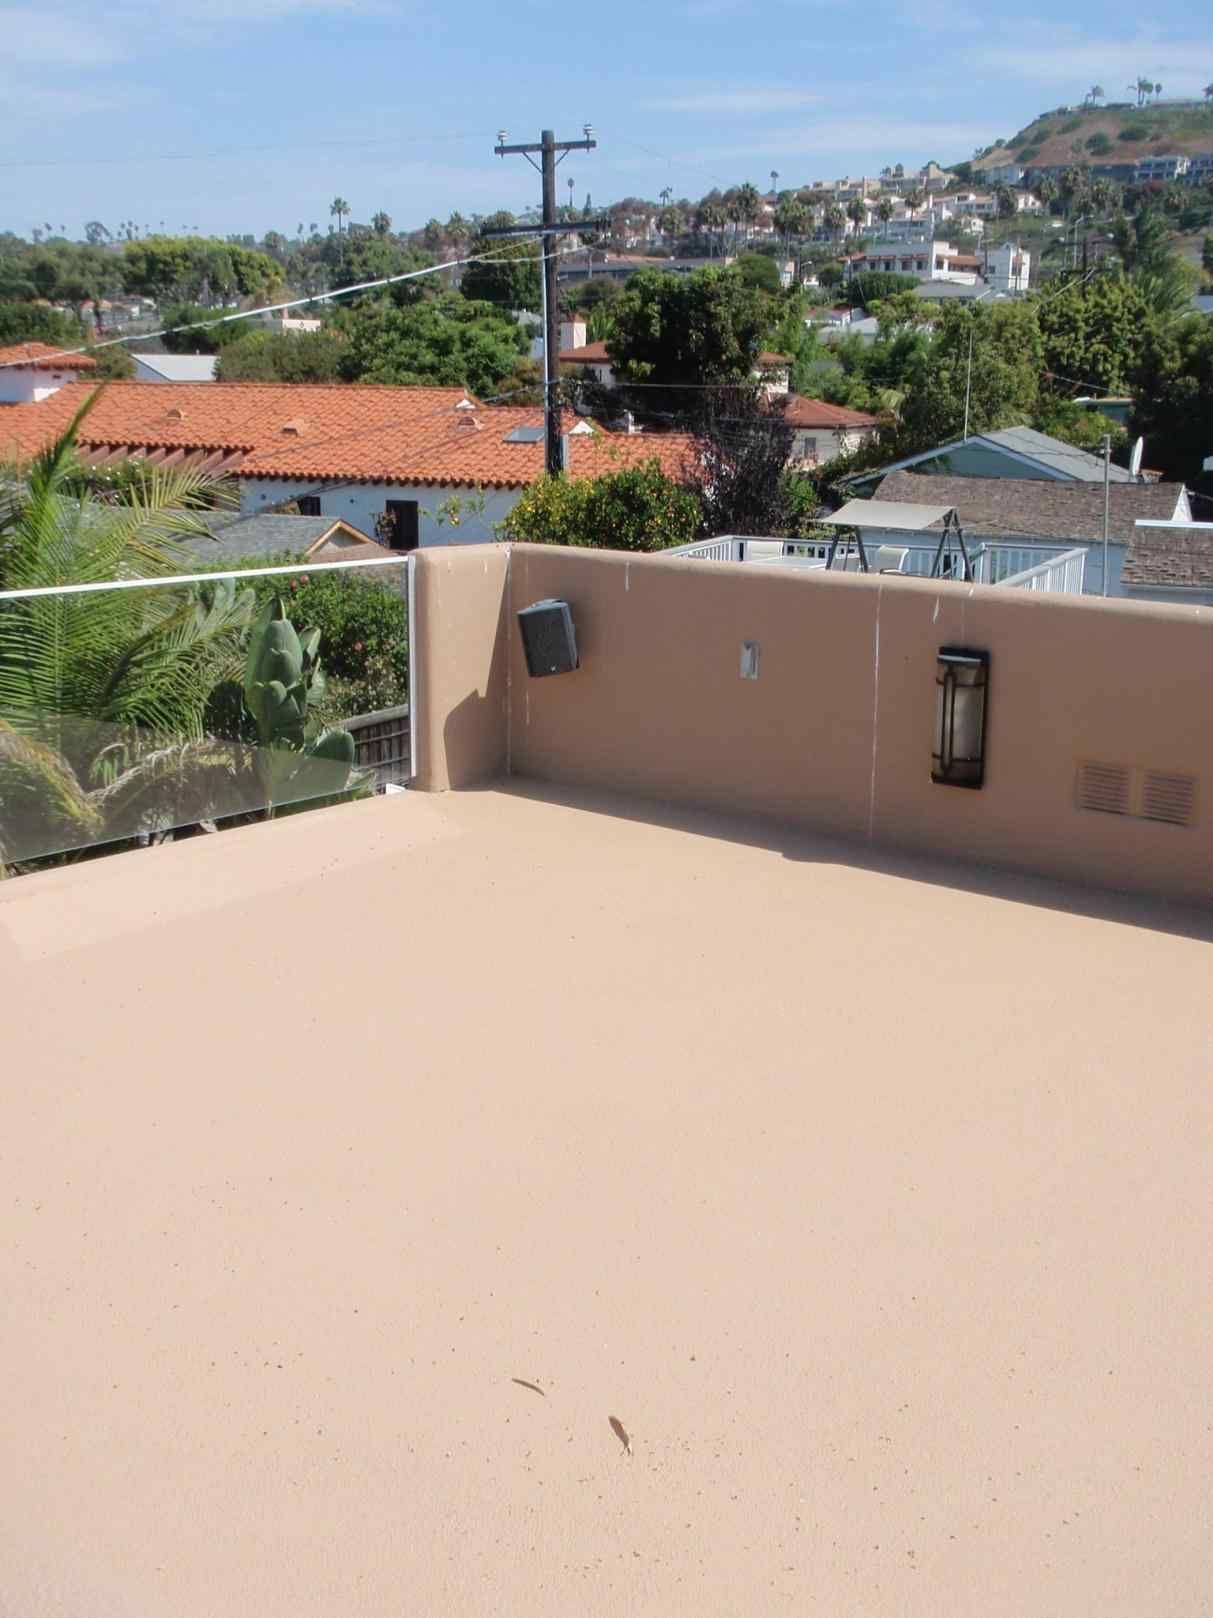 Concrete Roof Deck Waterproofing Home Roof Ideas Concrete Roof Roofing Roof Deck